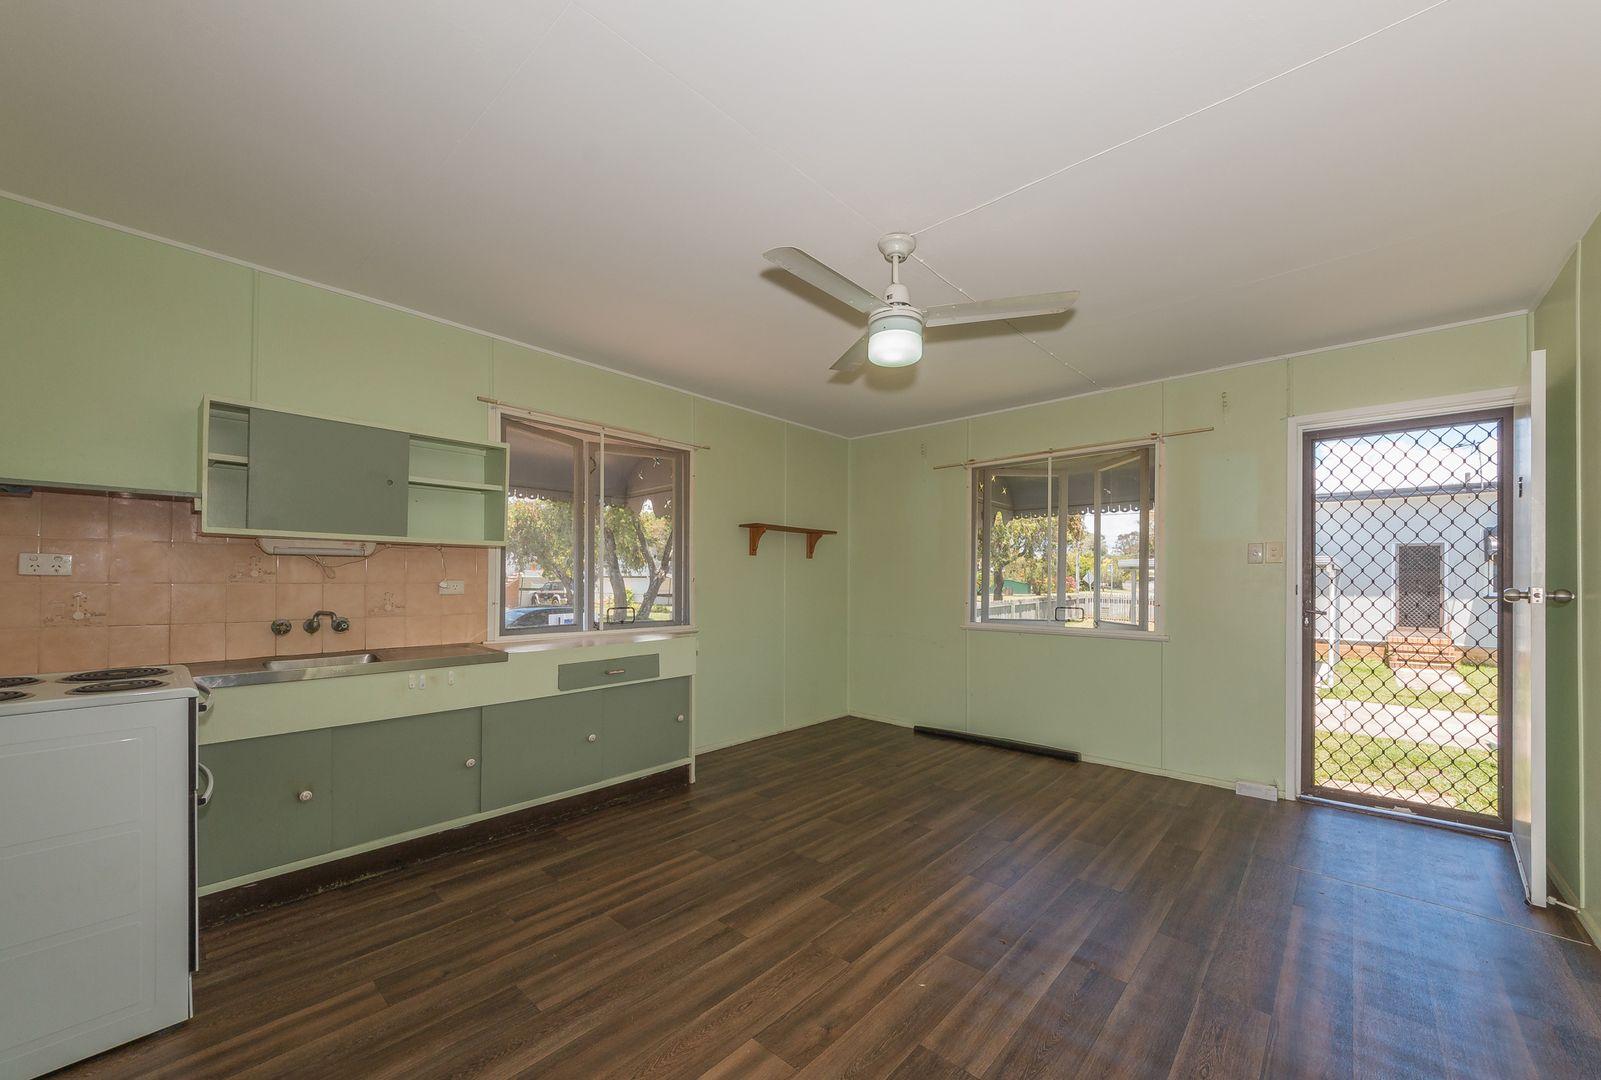 7/36 Cornelius Street, Clontarf QLD 4019, Image 2